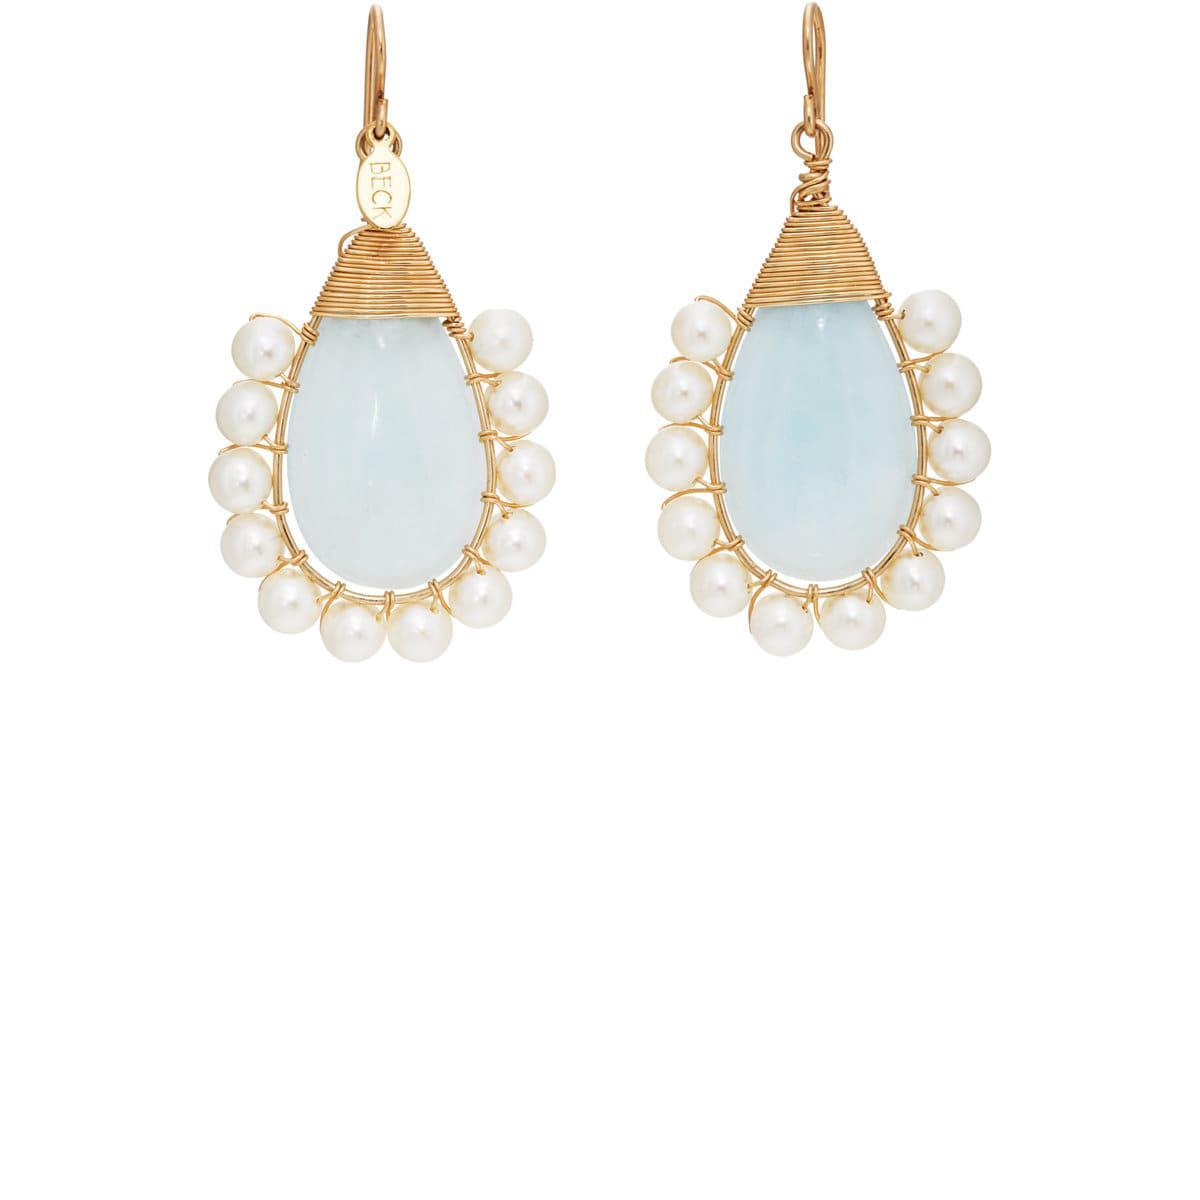 Beck Jewels Womens Lolita Drop Earrings qxP21bcd